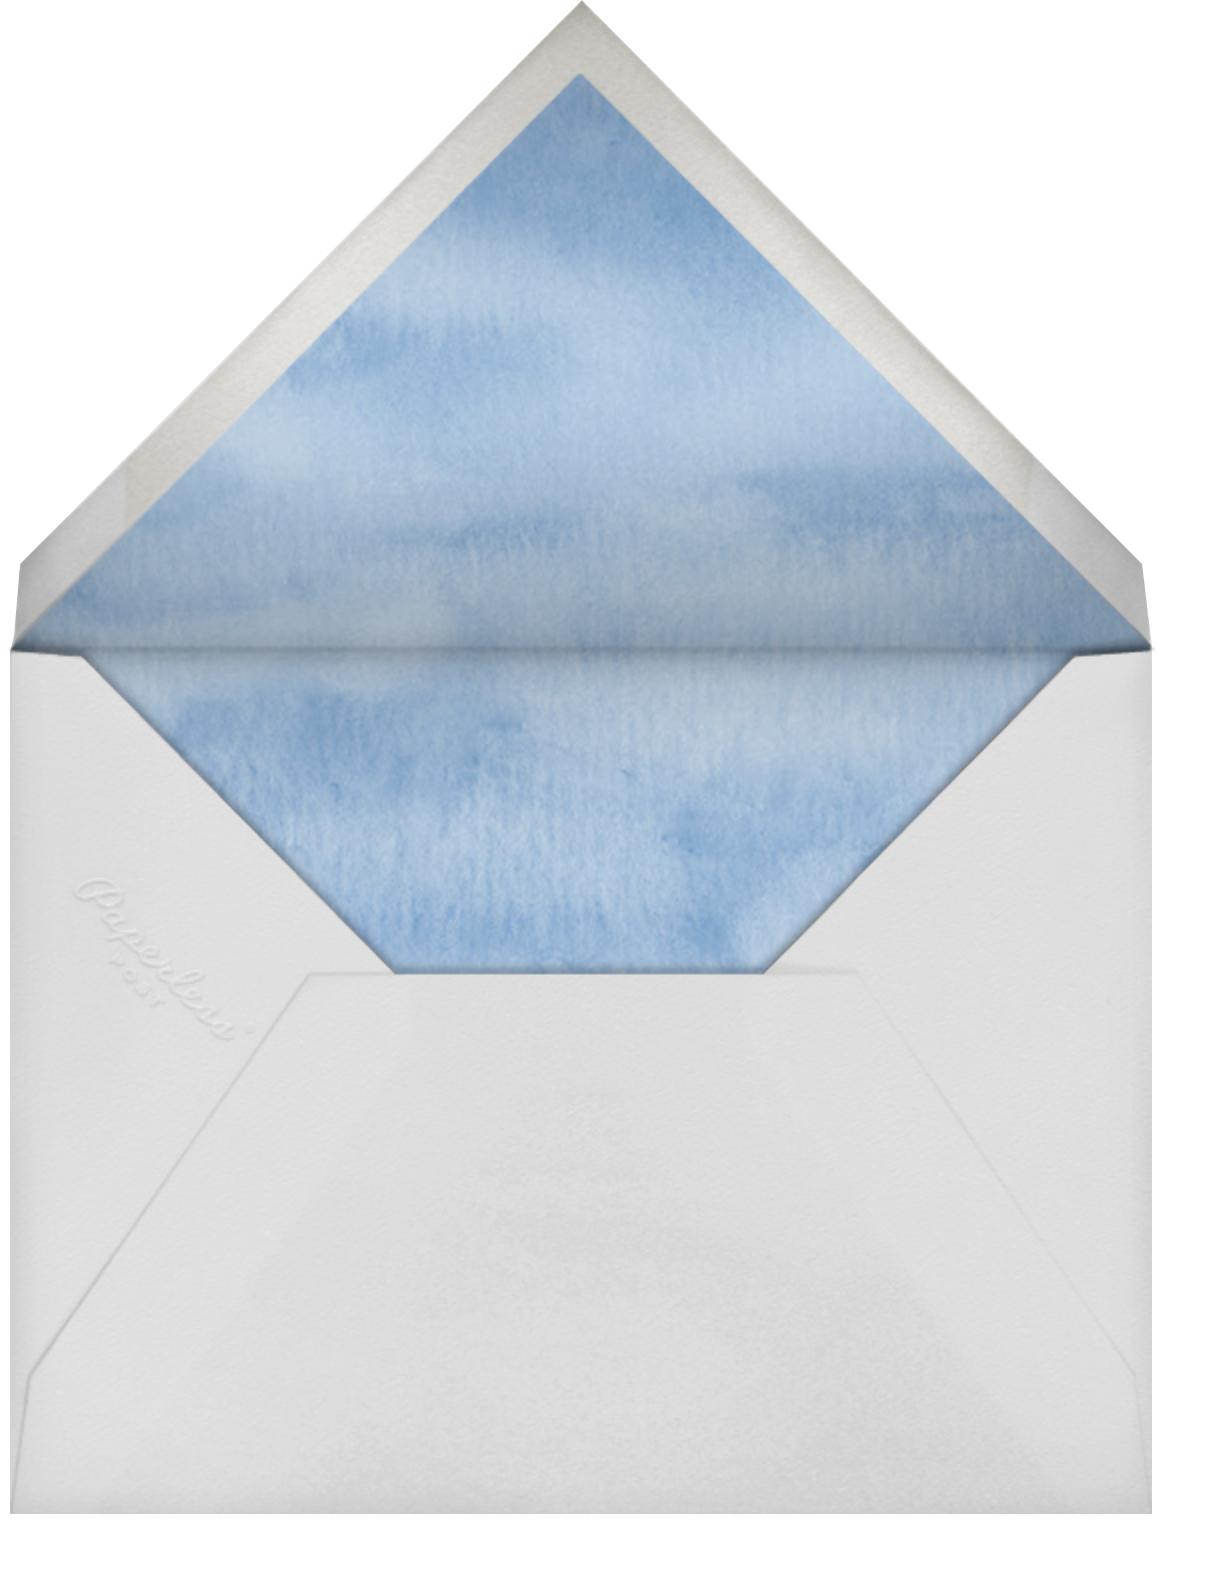 Wisteria Canopy (Invitation) - Tundra - Felix Doolittle - All - envelope back